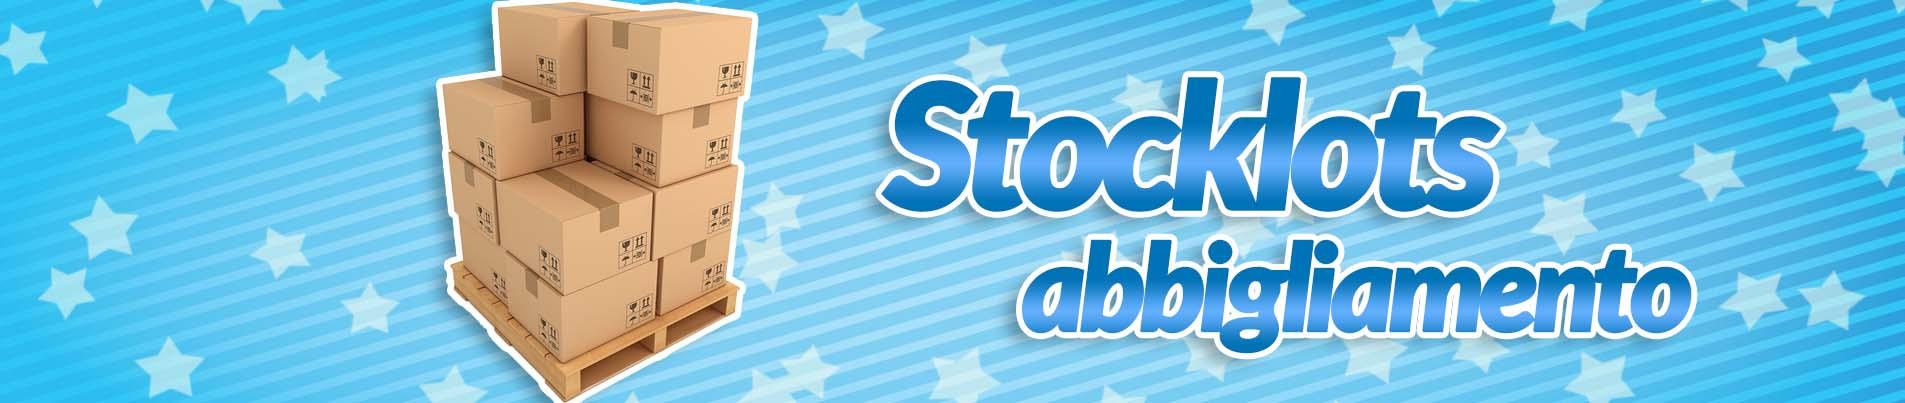 Stocklots